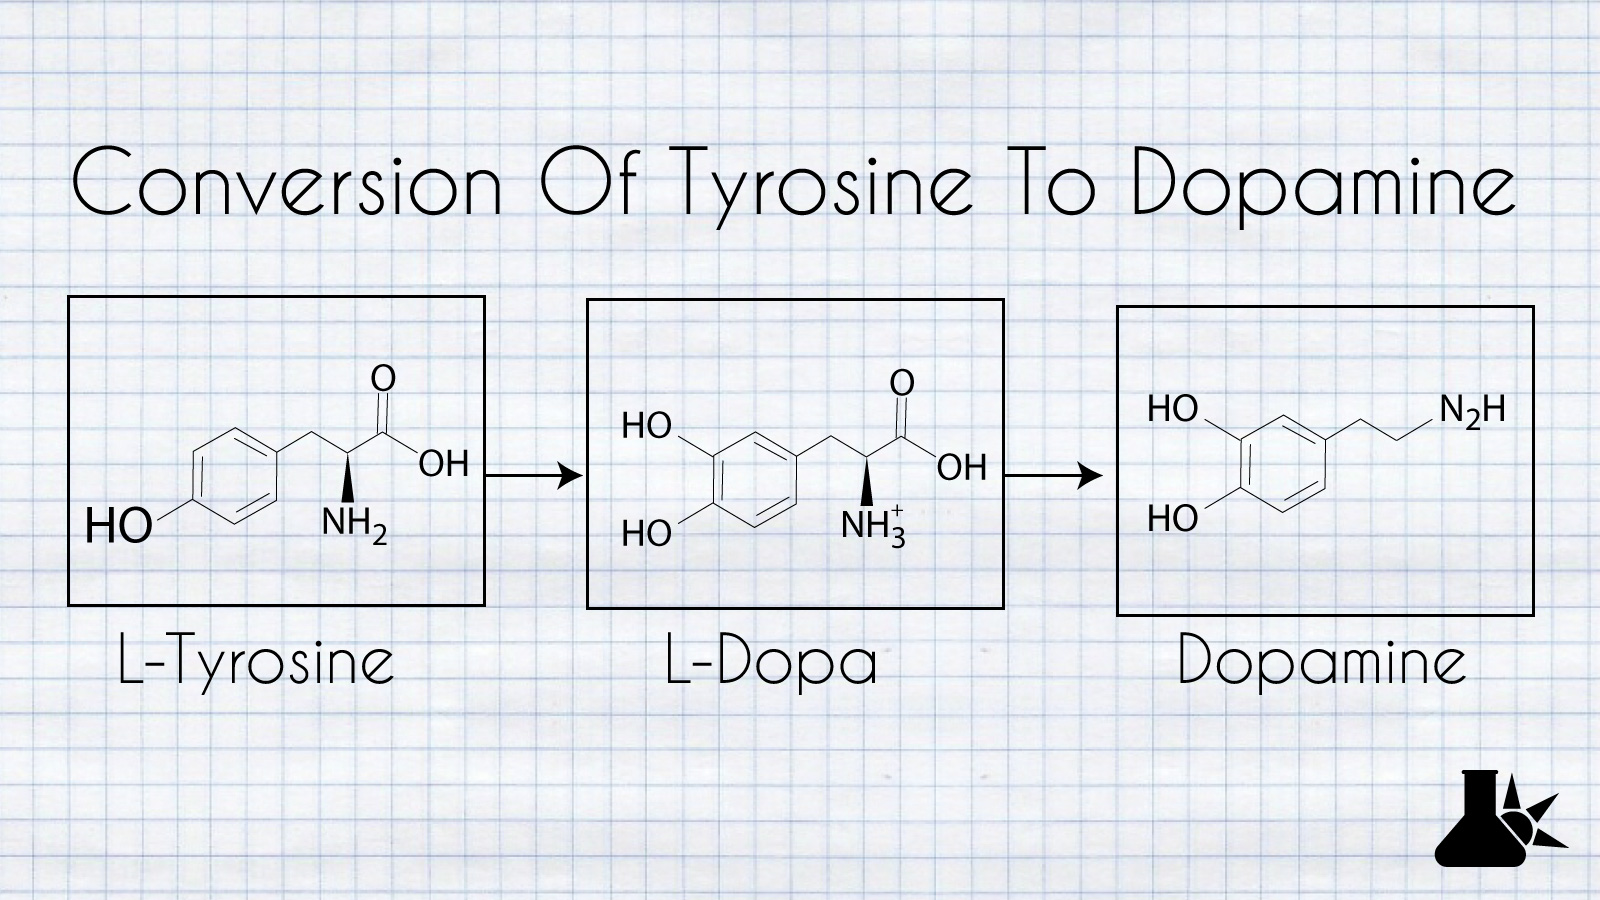 the conversion of tyrosine to dopamine